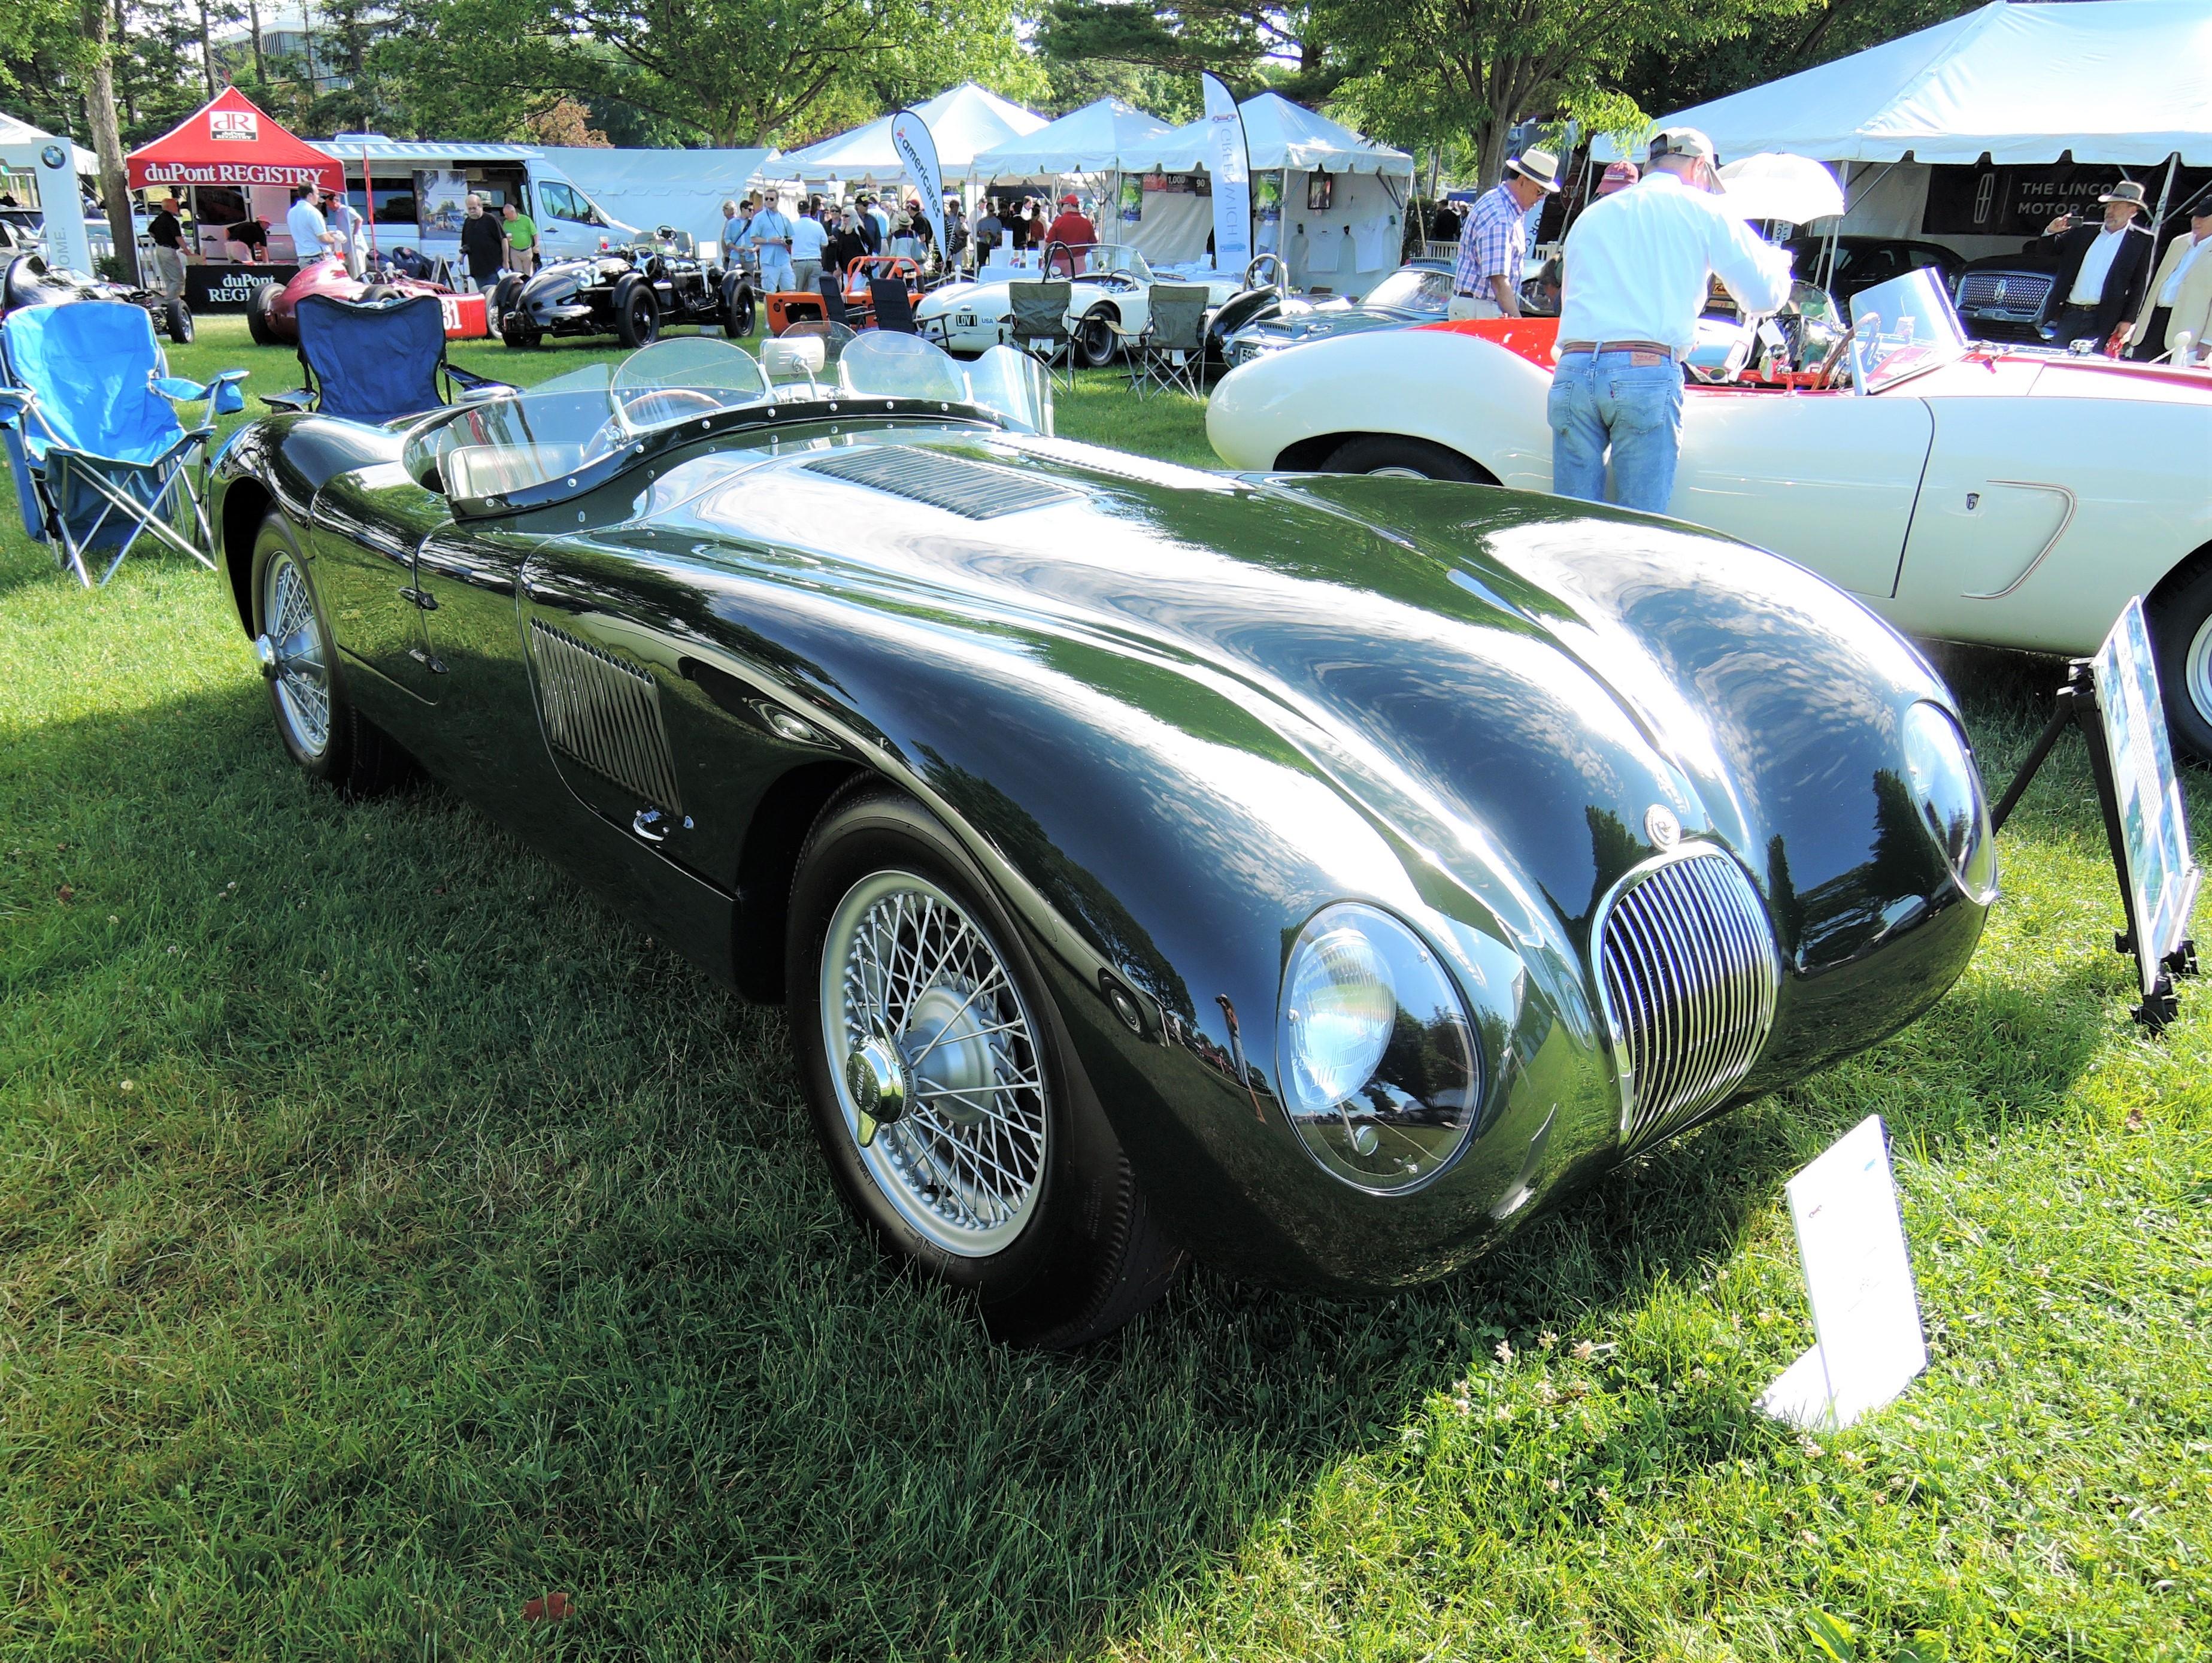 green 1952 Jaguar C-Type Race Car - Greenwich Concours d'Elegance 2017